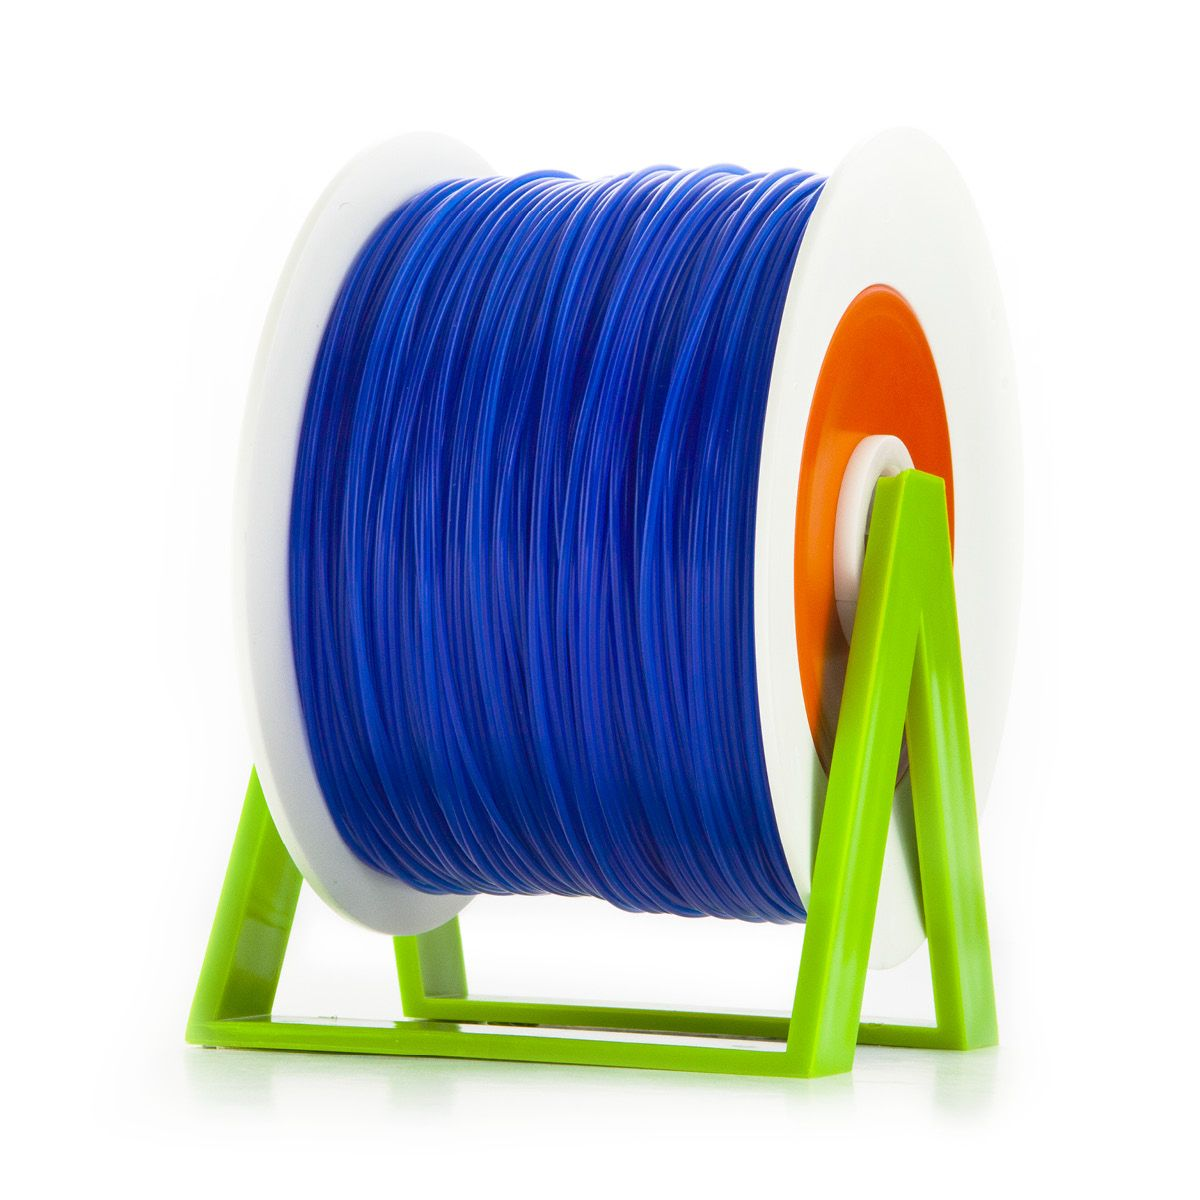 PLA Filament | Color: Indigo